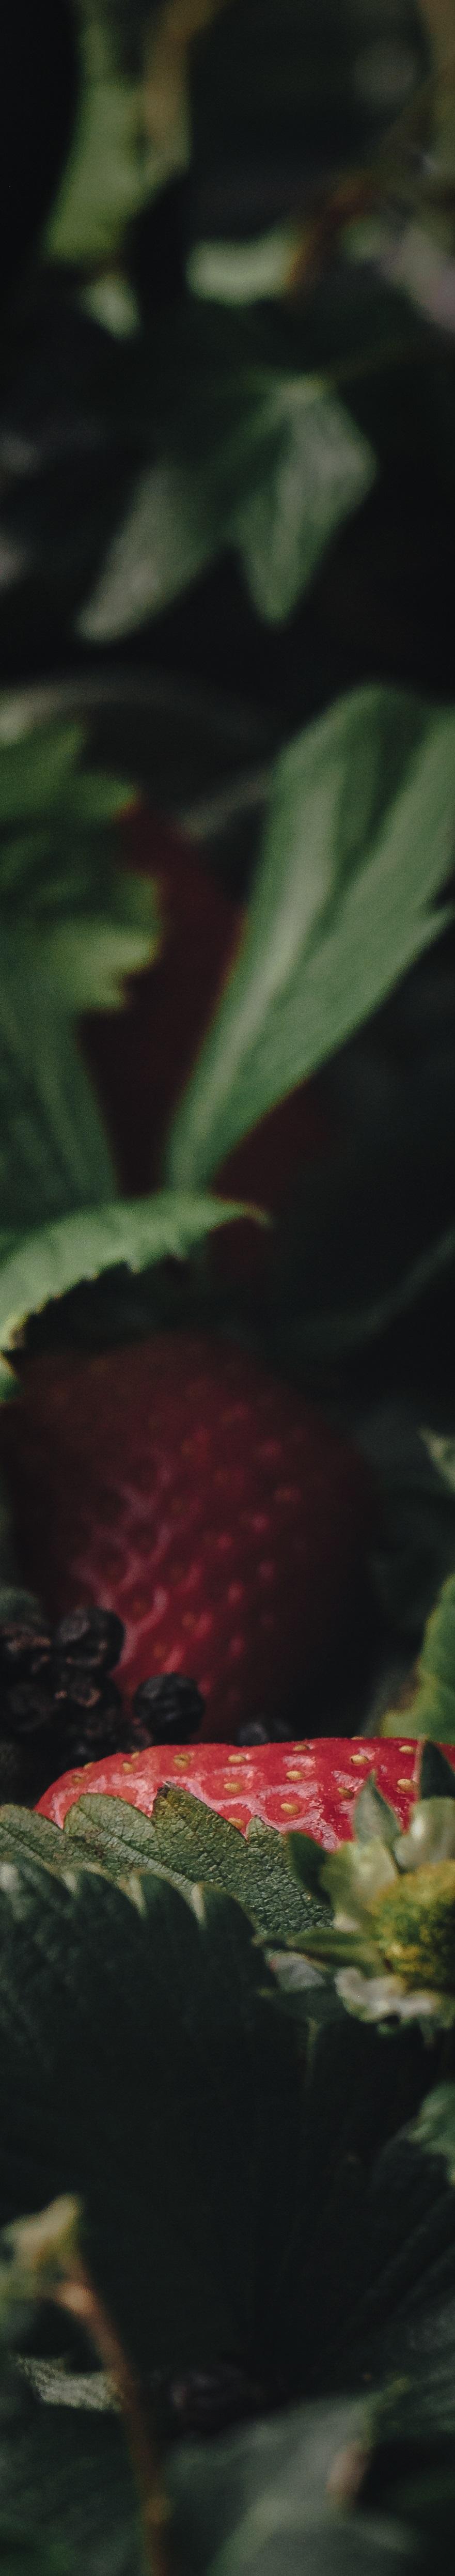 GGStrawberryCopyright+Faydit+Photography-1-2.jpg